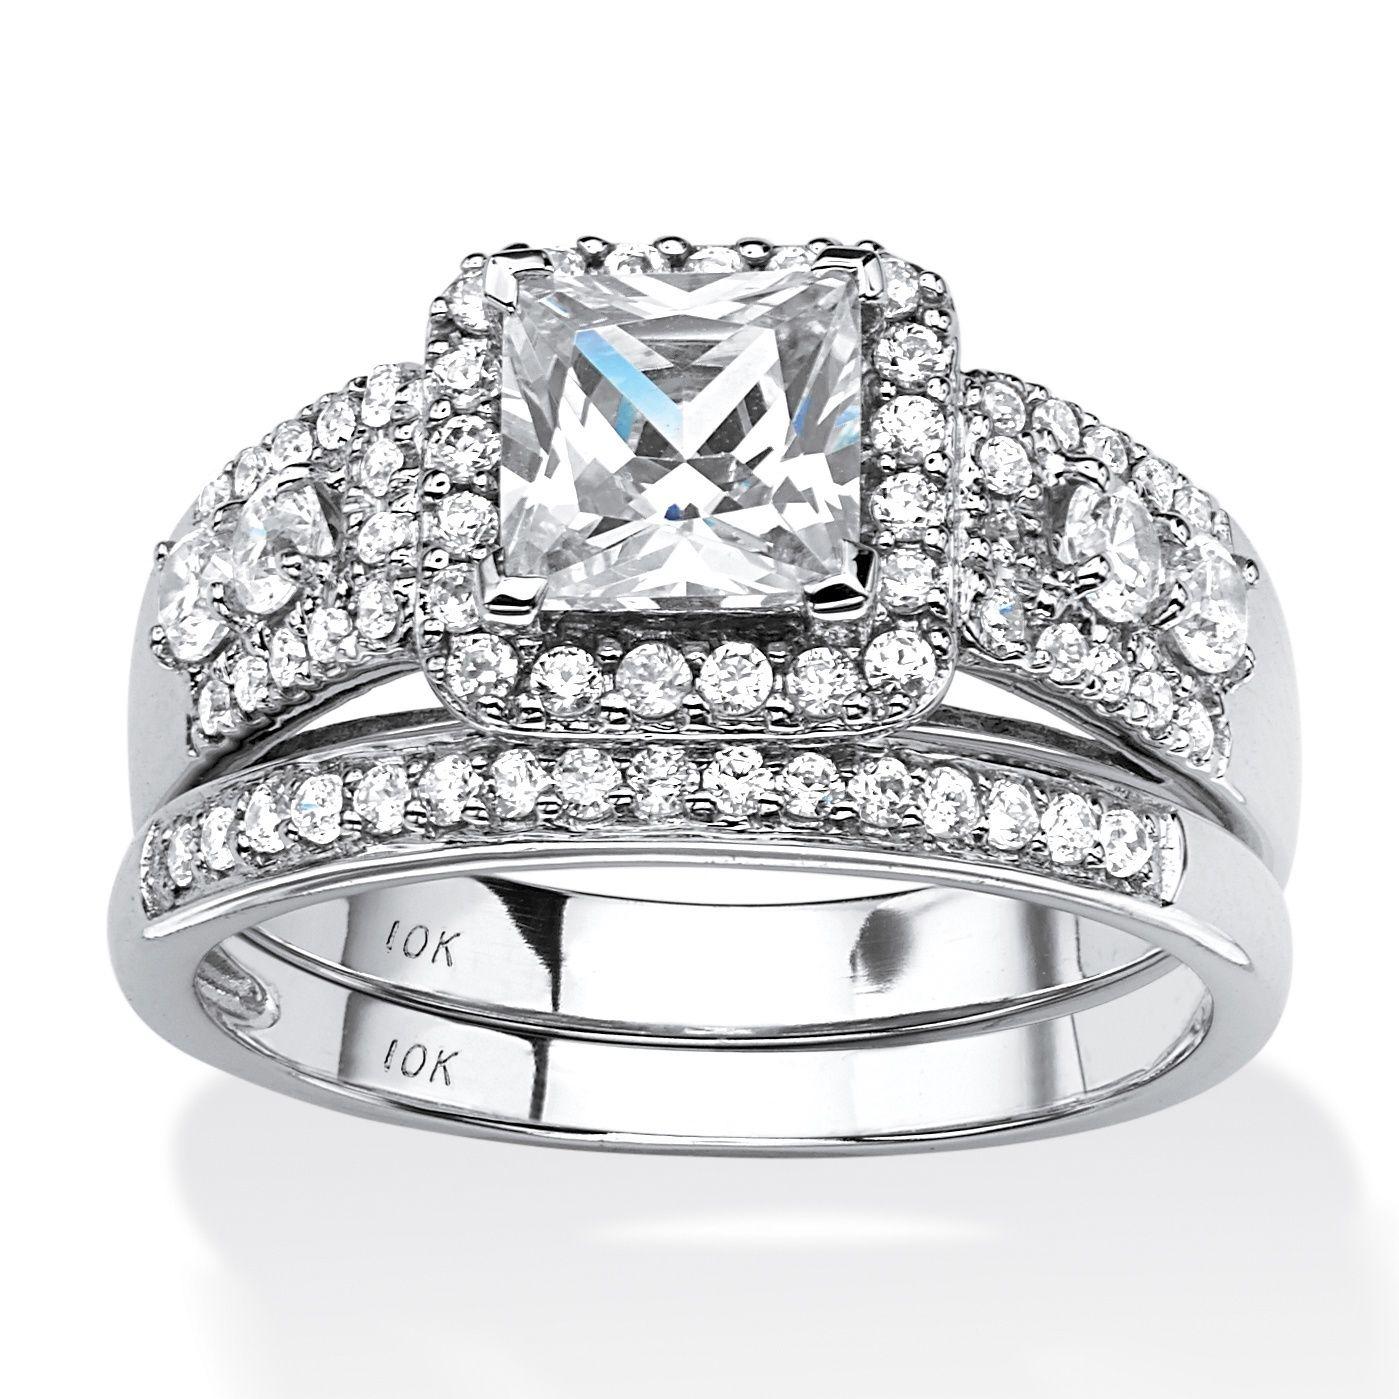 10K White Gold Cubic Zirconia Bridal Ring Set Bridesmaid